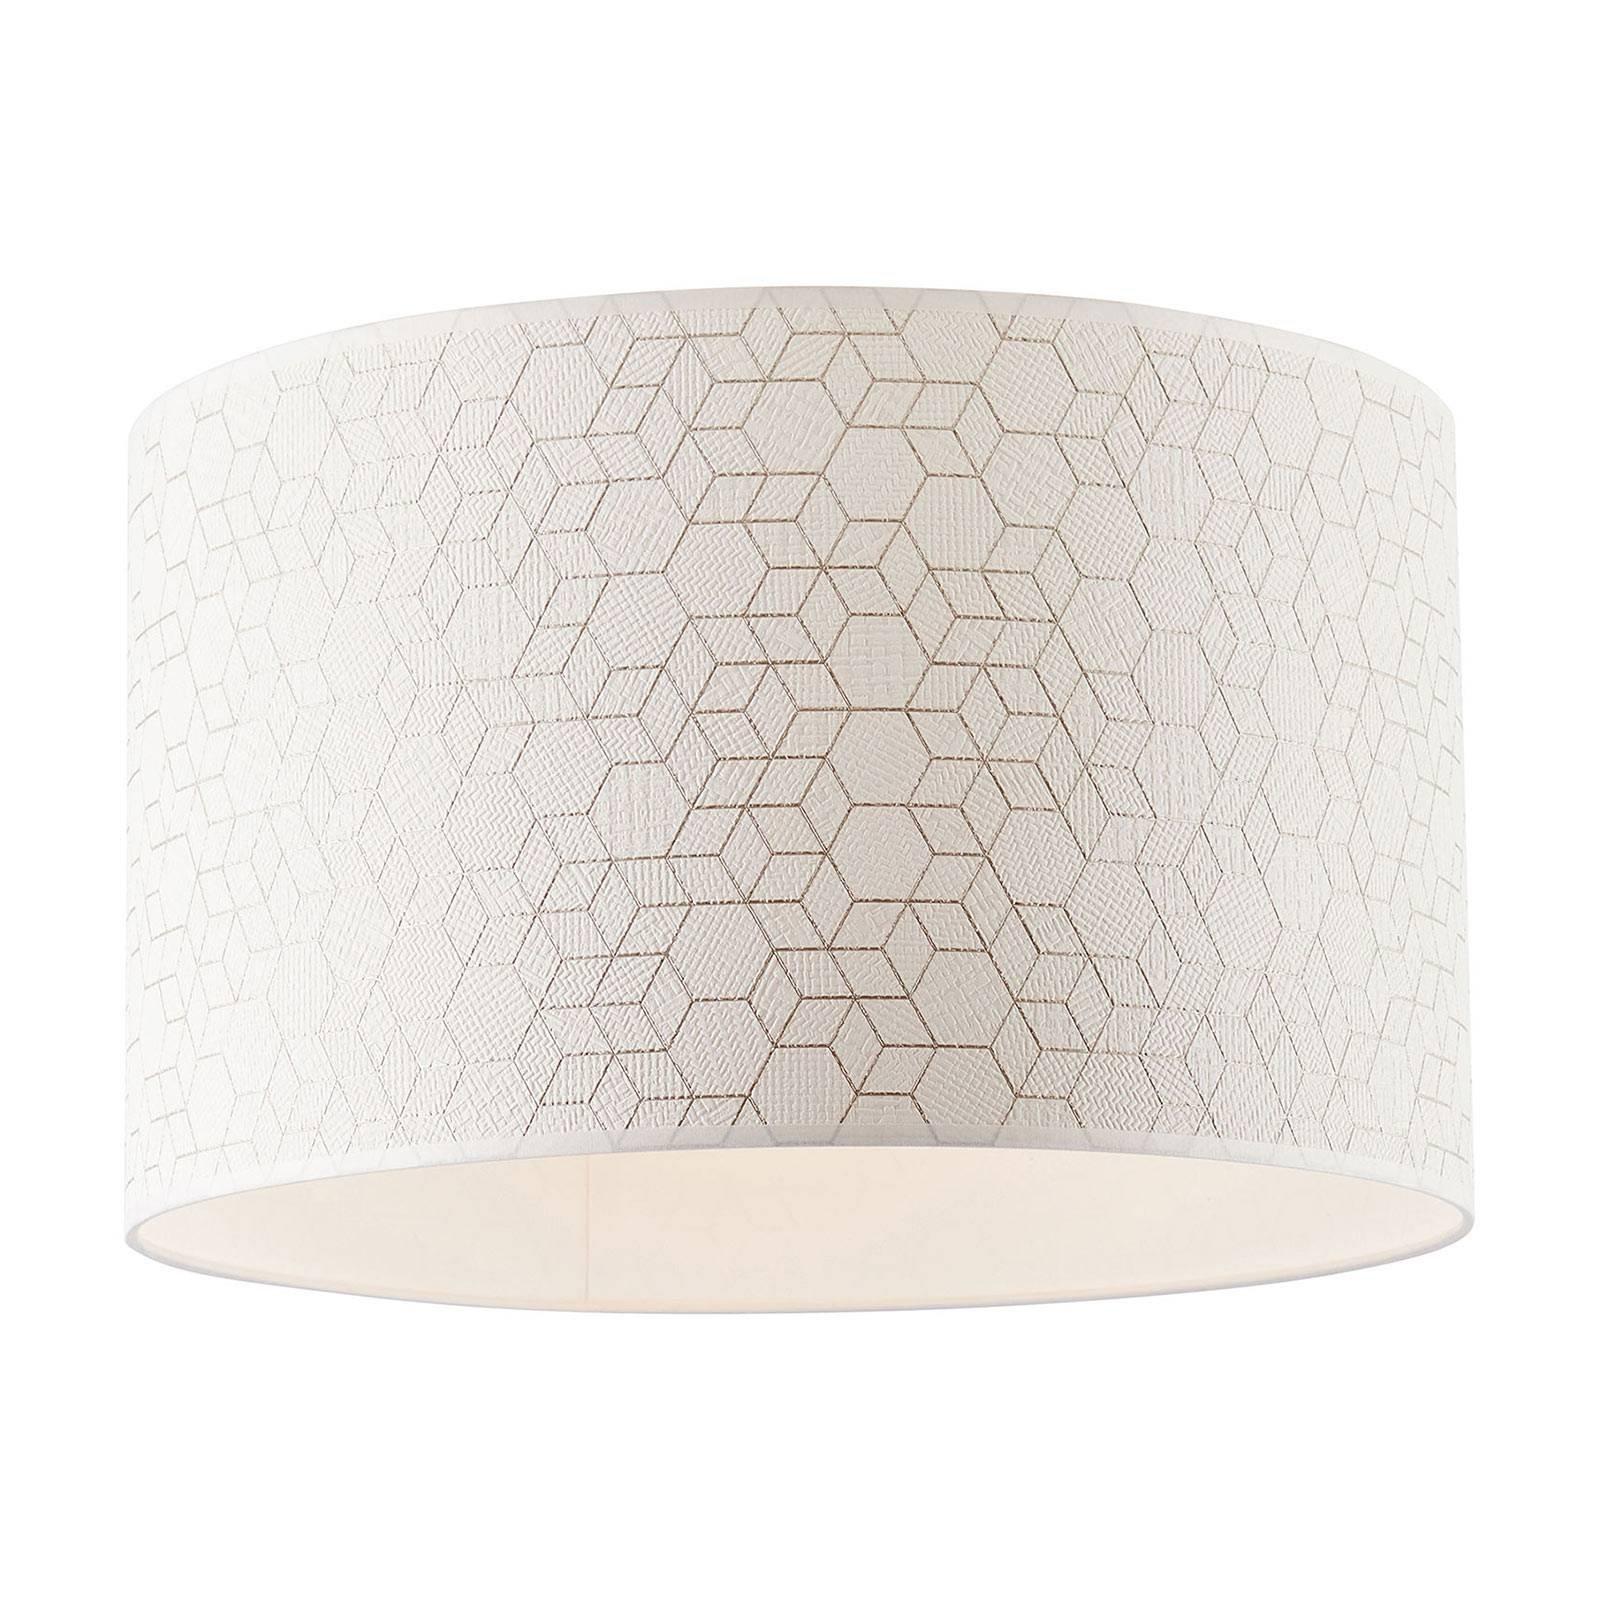 Taklampe Galance, hvit, Ø 40 cm